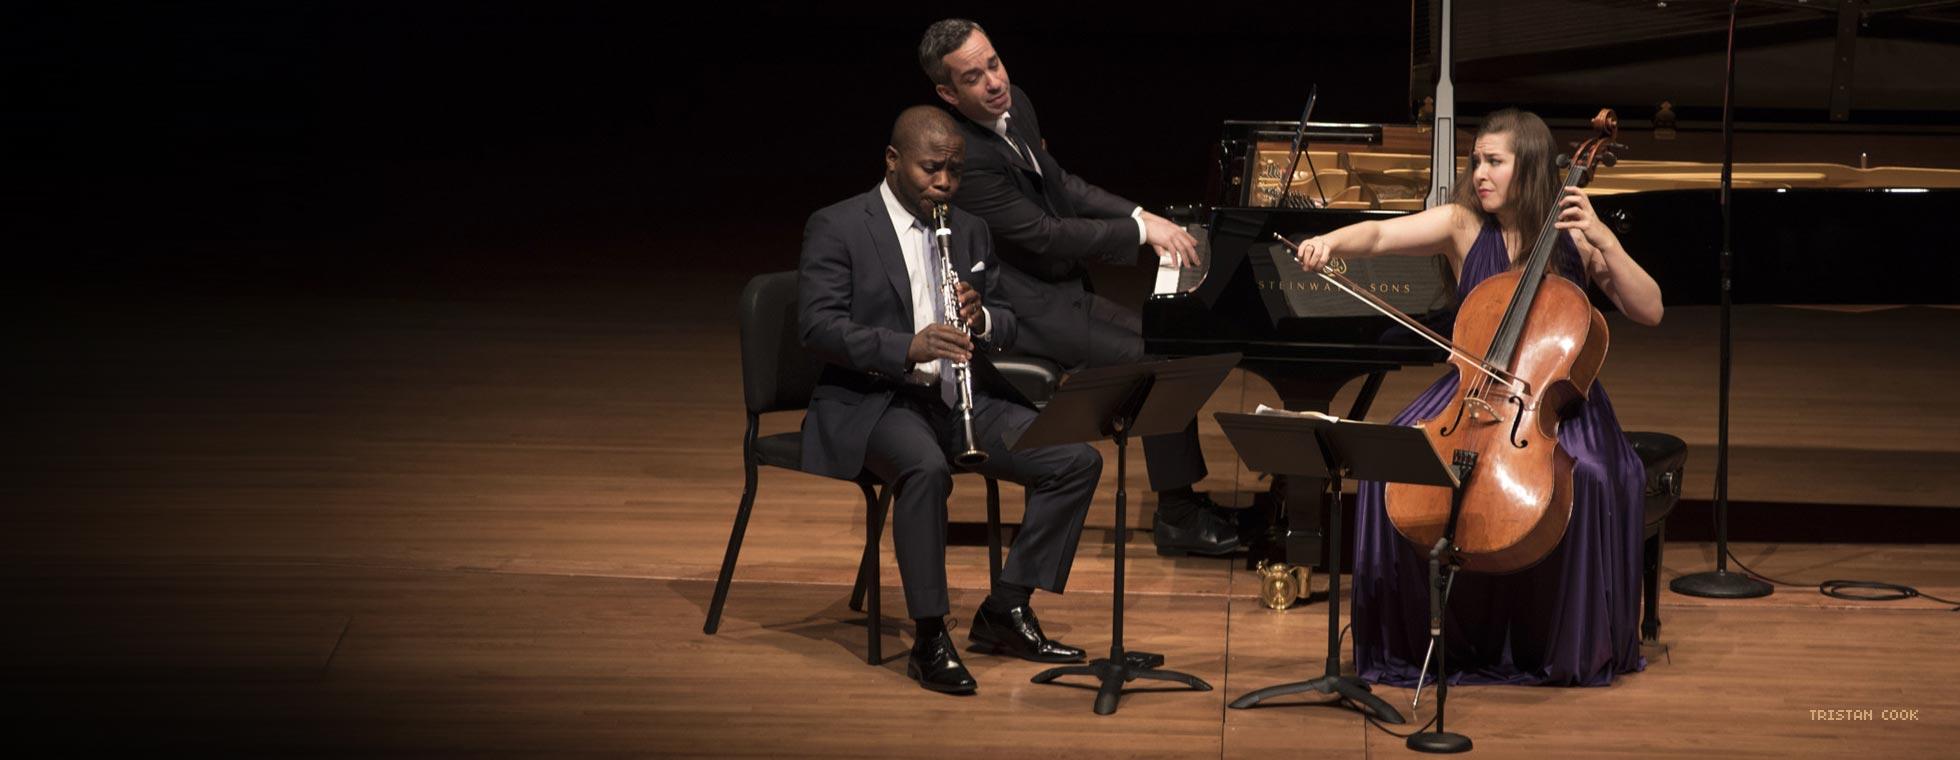 Clarinetist AnthonyMcGill, pianist Inon Barnatan, and cellist Alisa Weilerstein perform on stage.